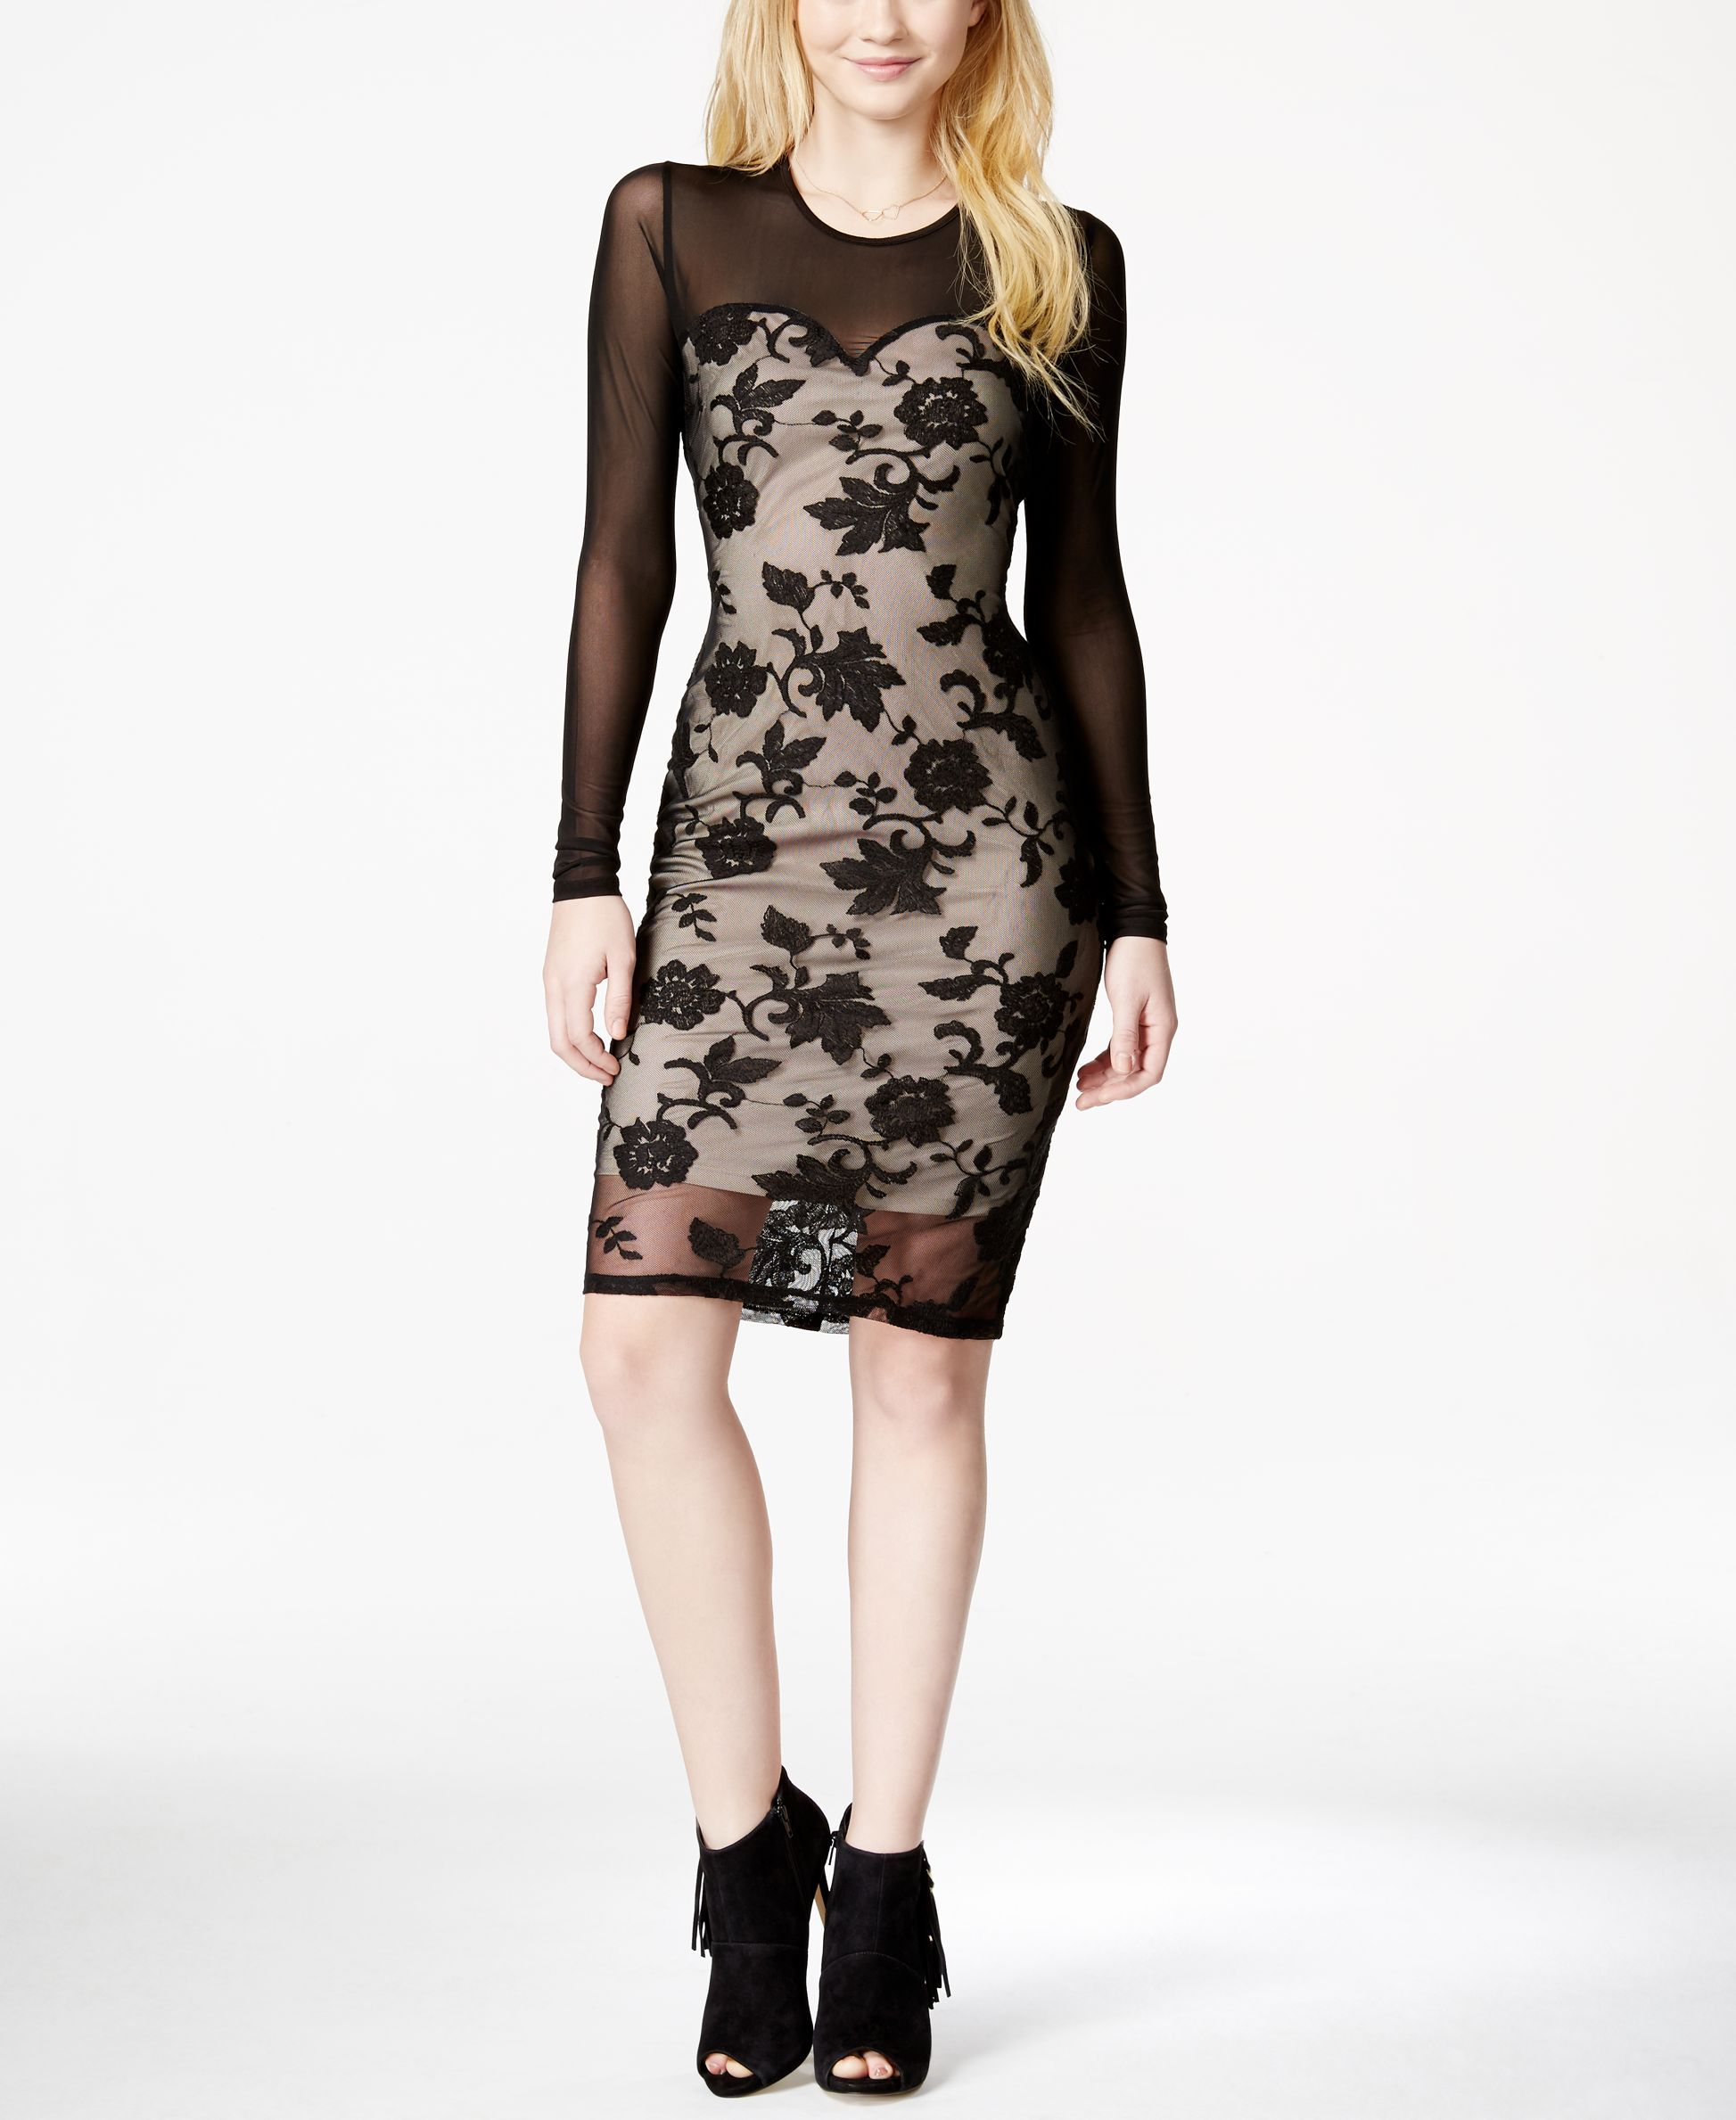 Material girl juniorsu illusion embroidered contrast bodycon dress